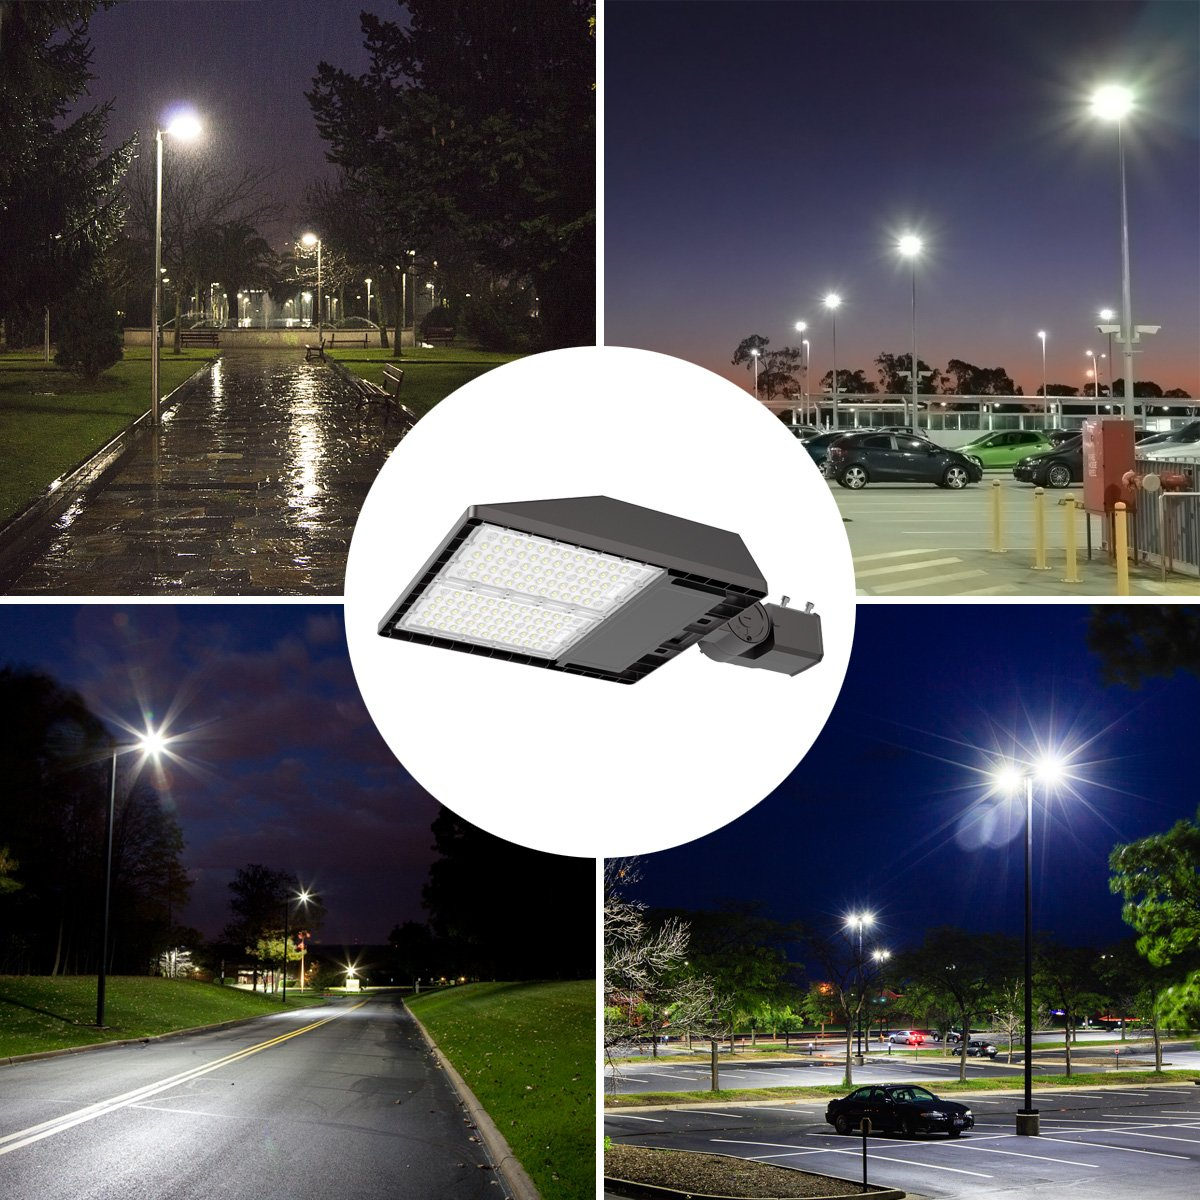 Led Parking Lot Lighting 200 Watt Adiding Street Area Shoebox Pole Light with Photocell Sensor 3-Type Mountings Lumileds LED 26000Lm Daylight 5700K Bright White Light Shorting Circuit Cap IP66 UL DLC